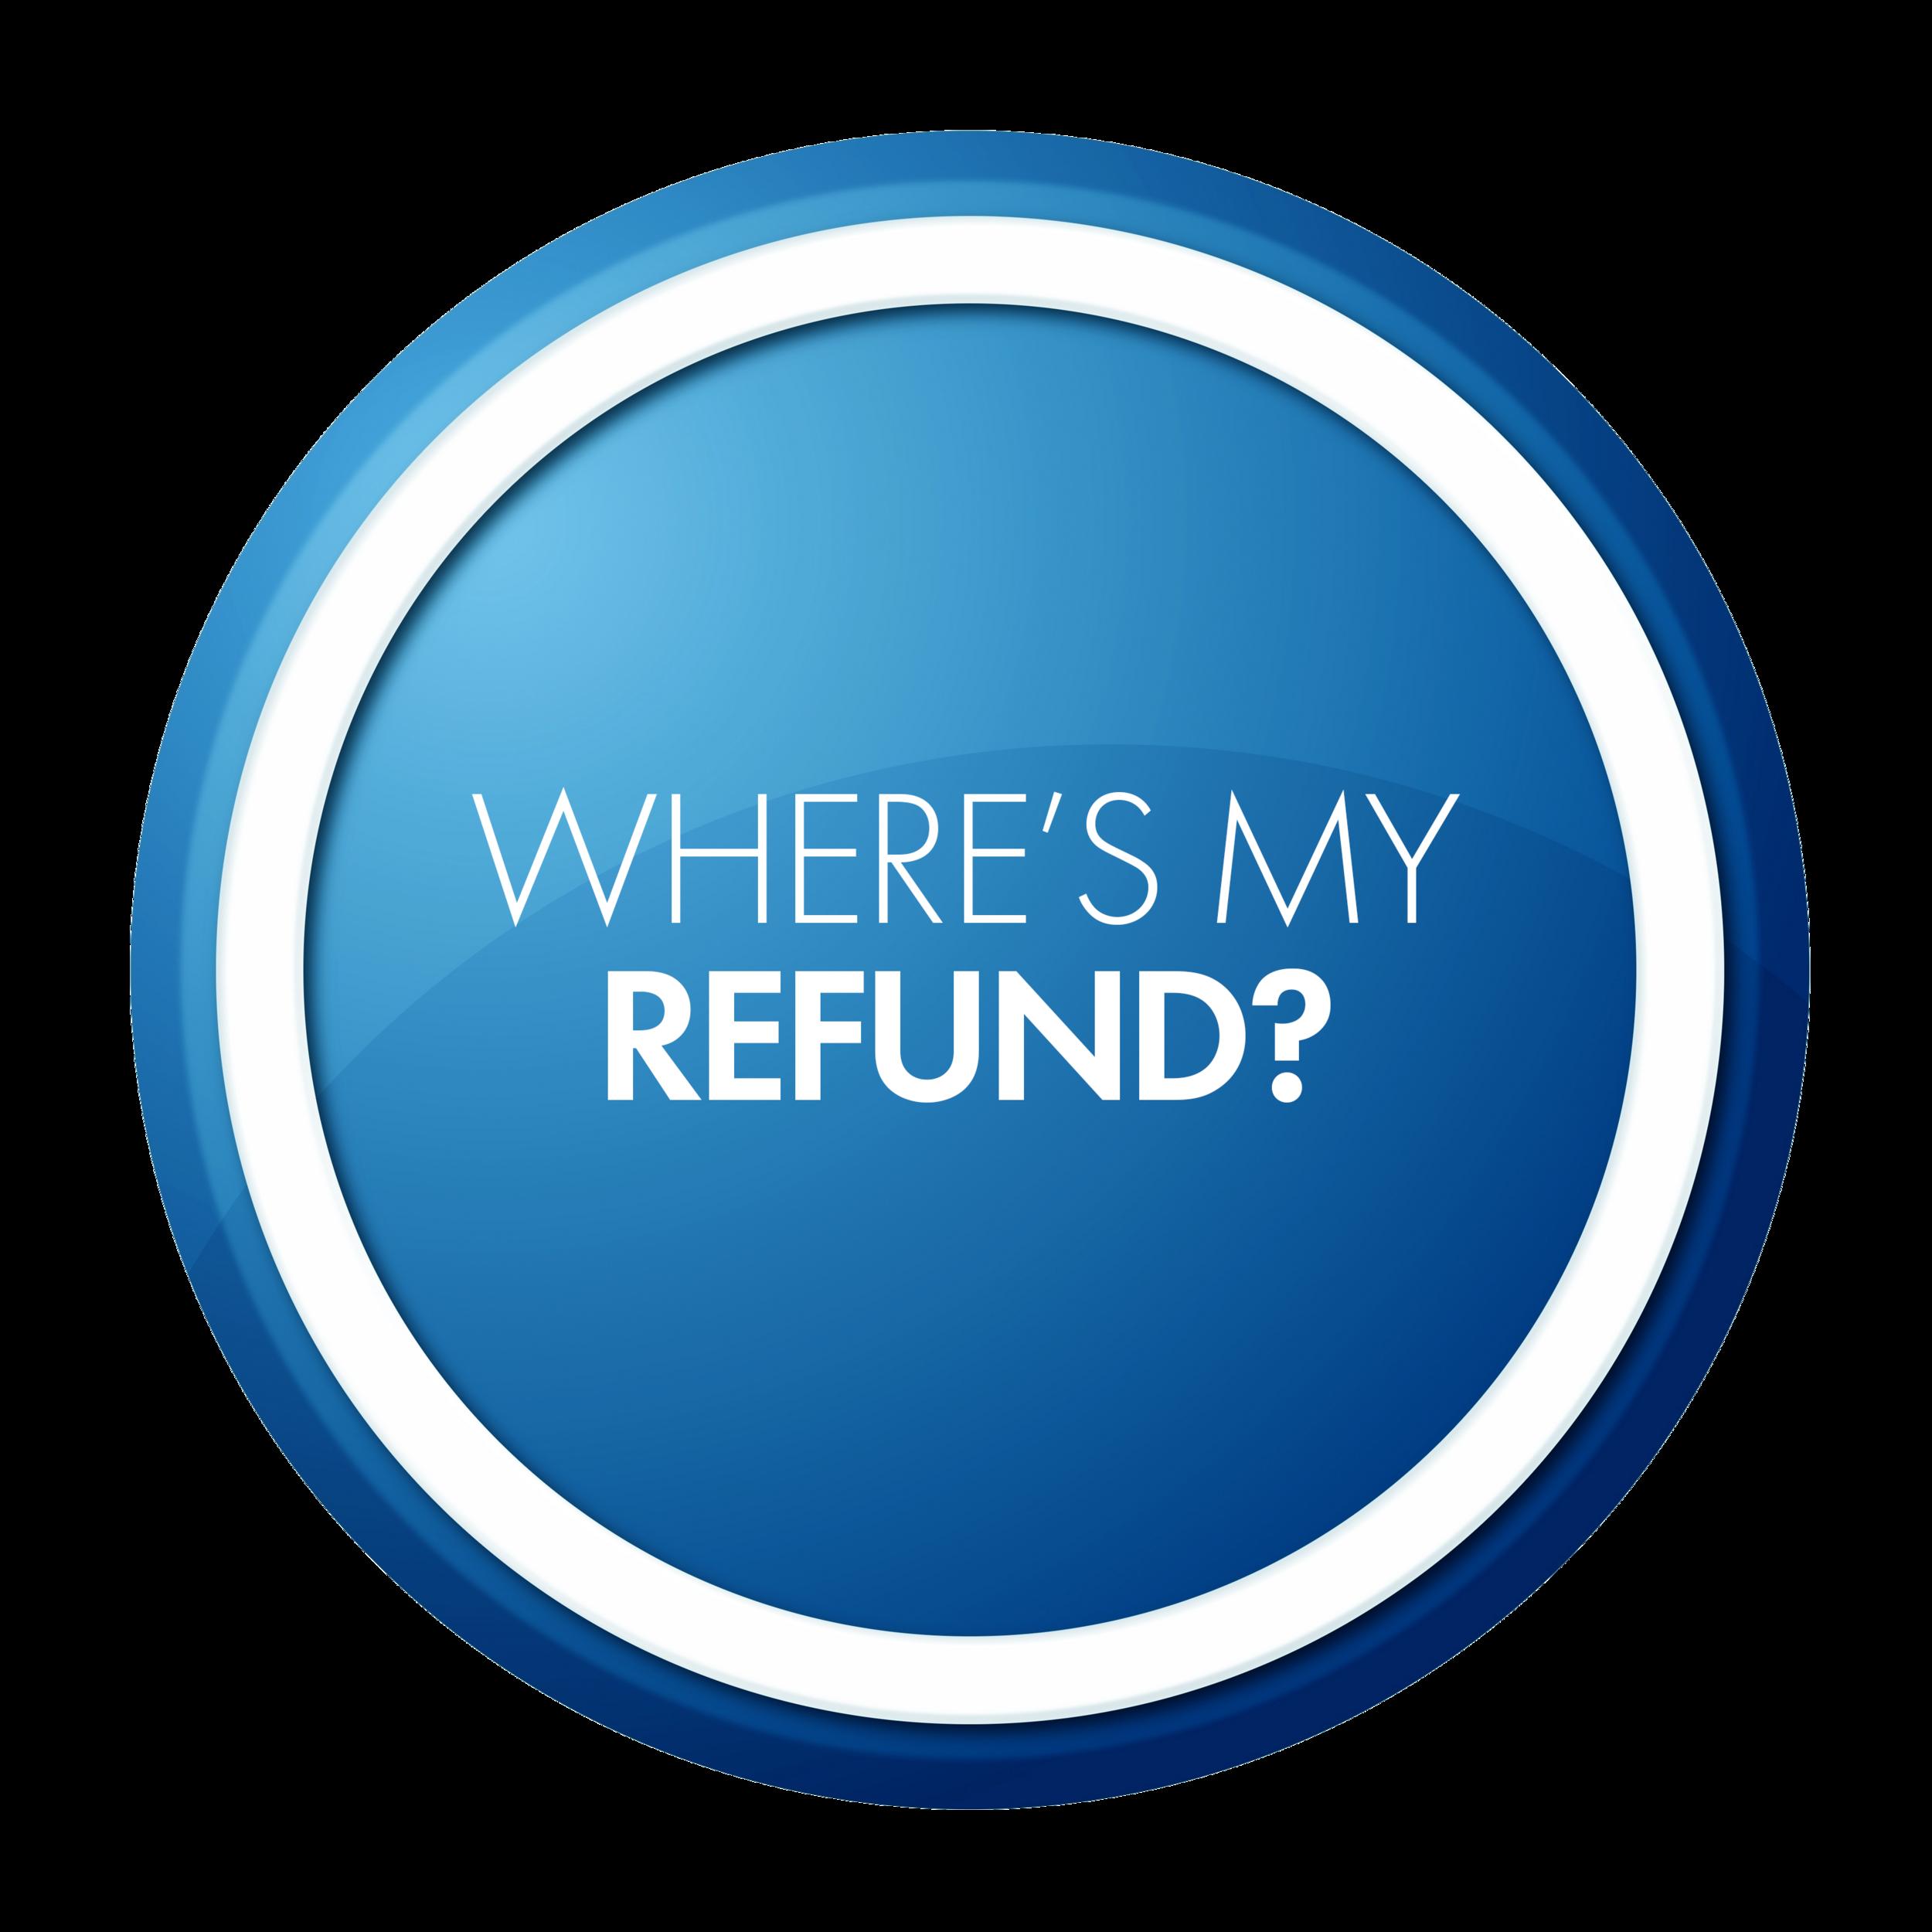 Where's My Refund?